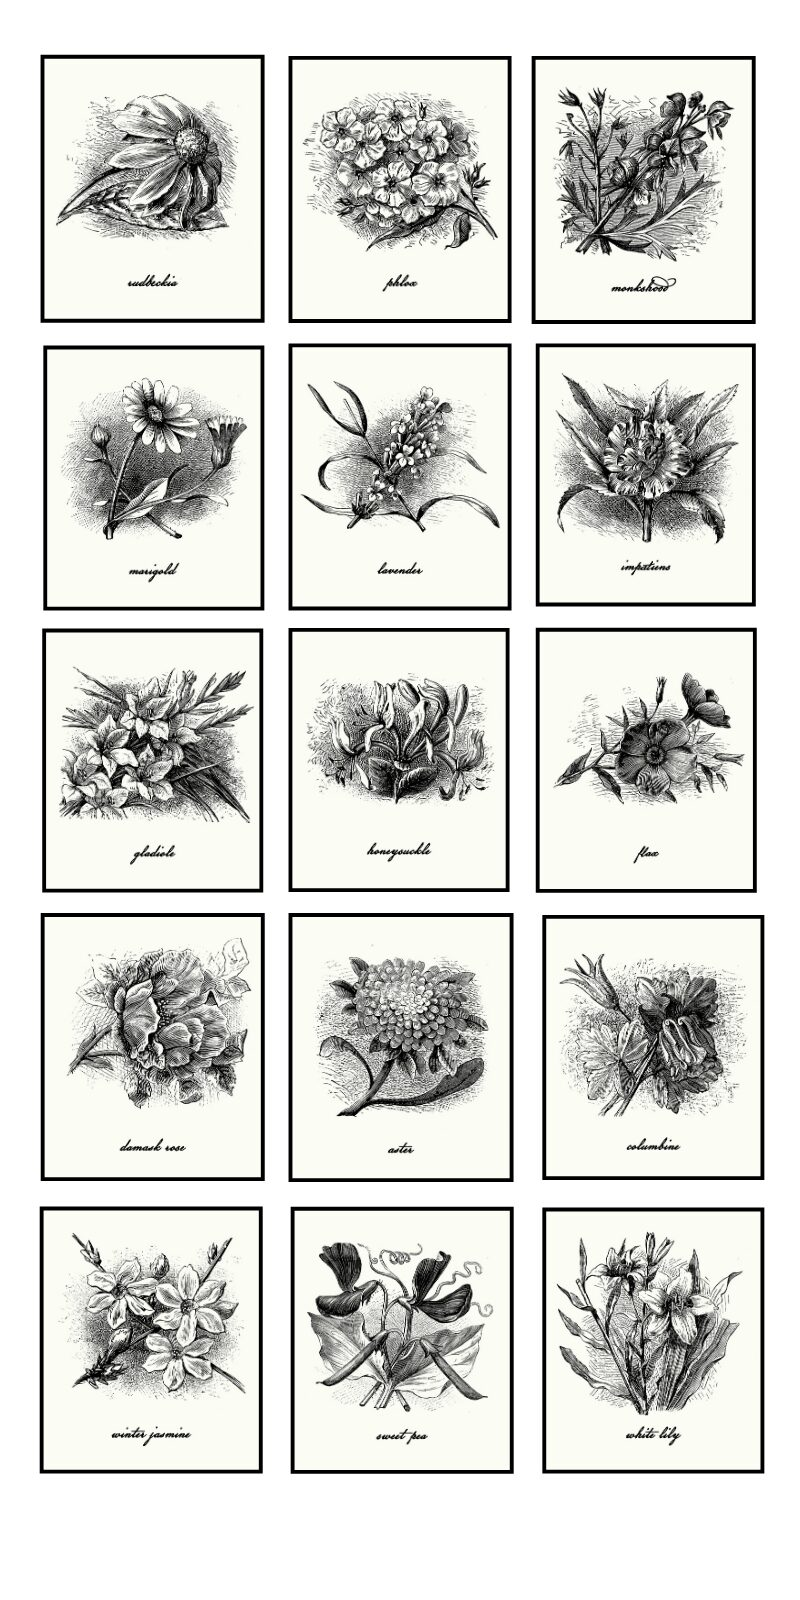 15 Vintage Black and White Farmhouse Style Botanical Prints